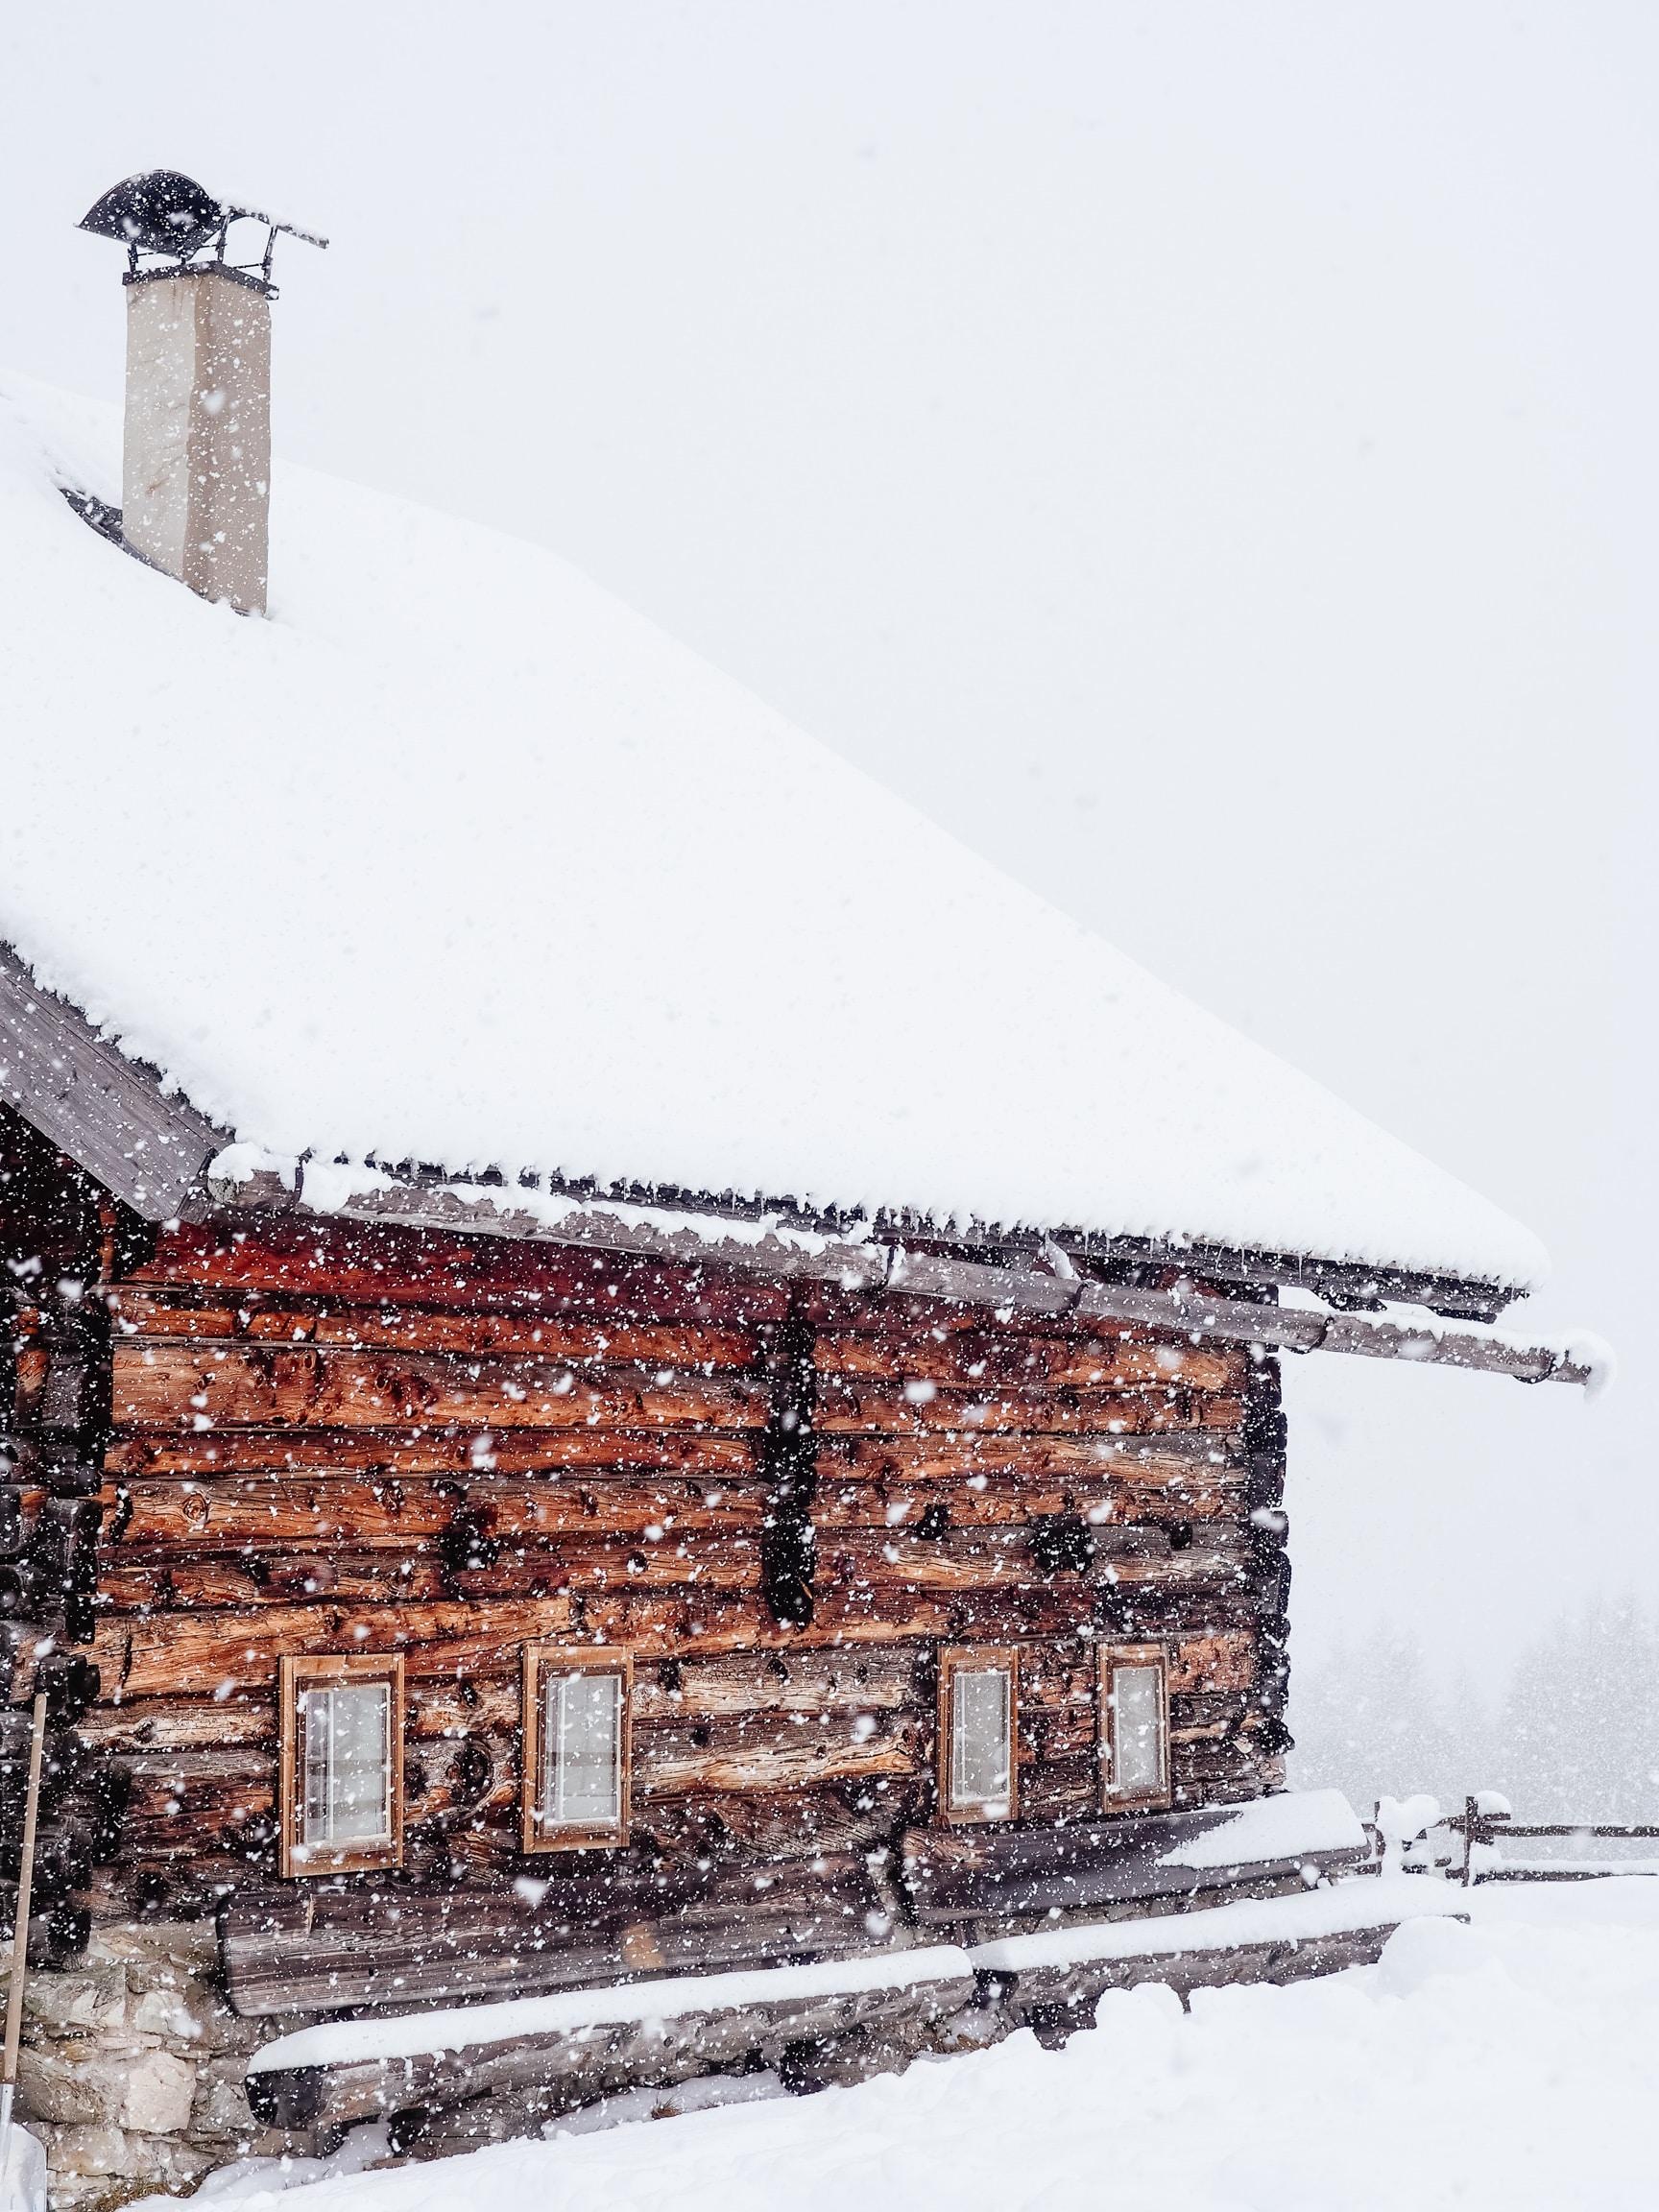 A side view of a snow covered ski lodge, Südwiener Hütte, in Austria